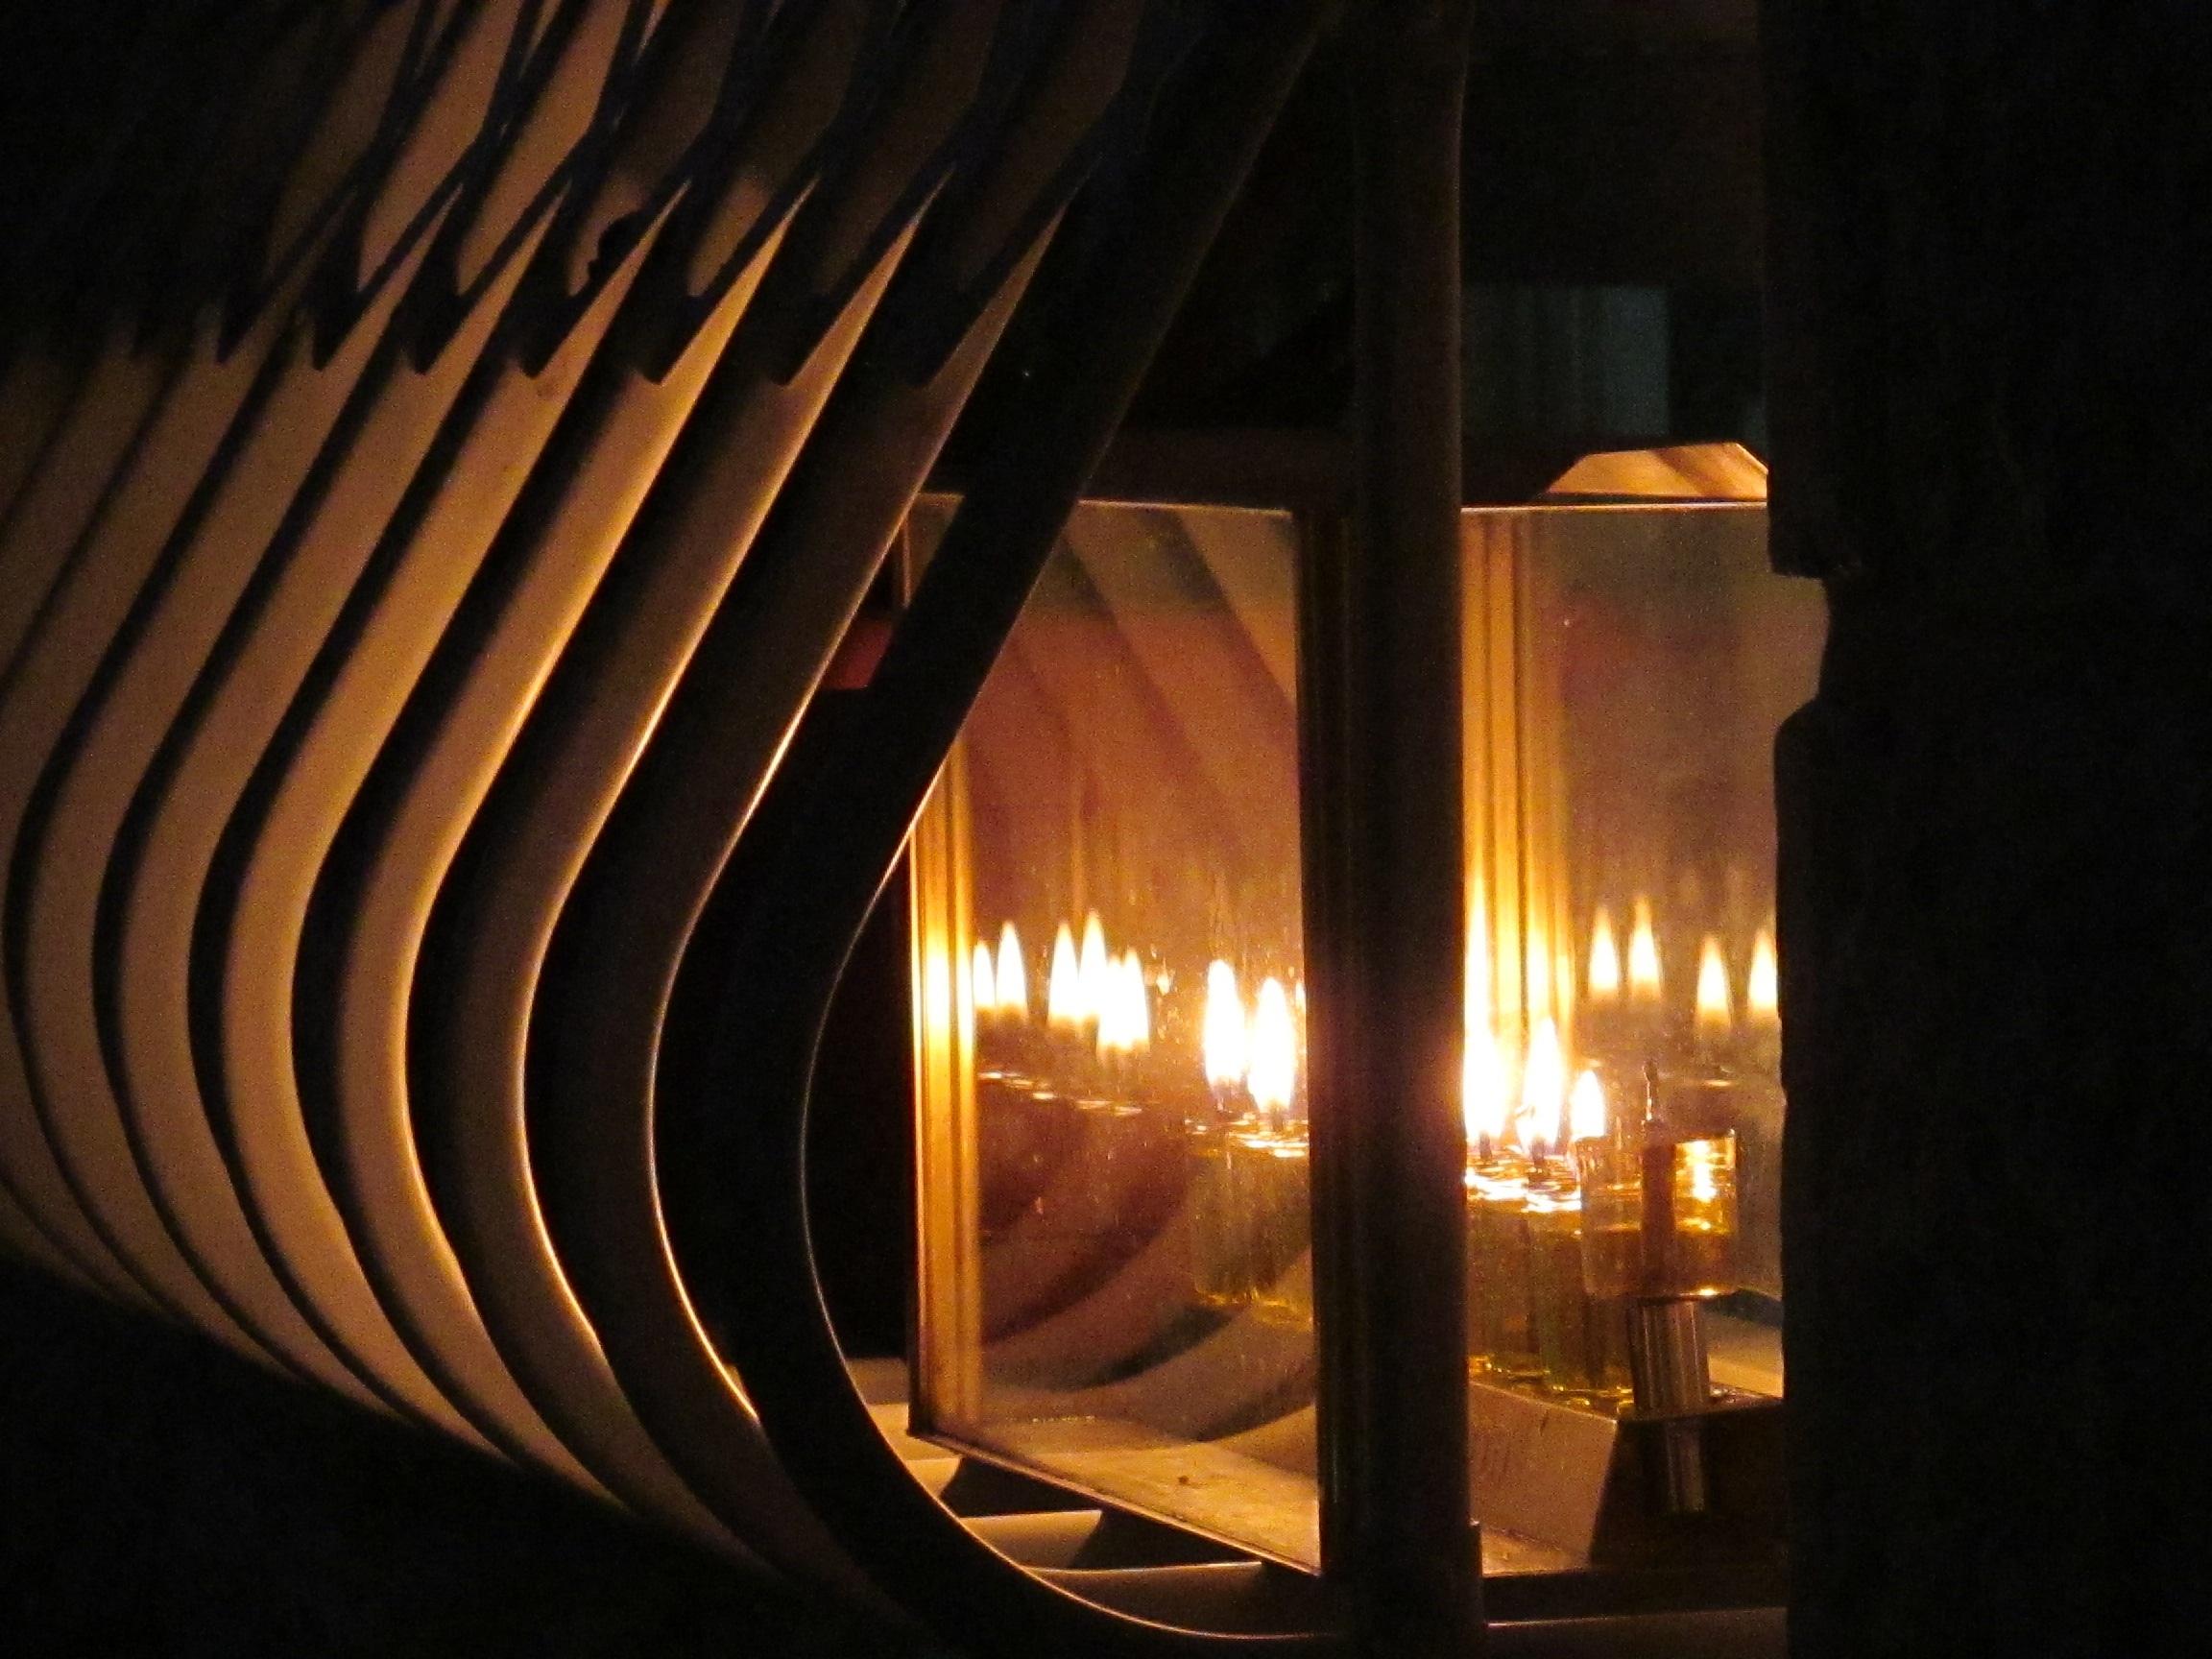 Light Night Sunlight Celebration Ceiling Reflection Symbol Holiday Darkness Candle  Lighting Celebrate Festival Candles Seasonal Light